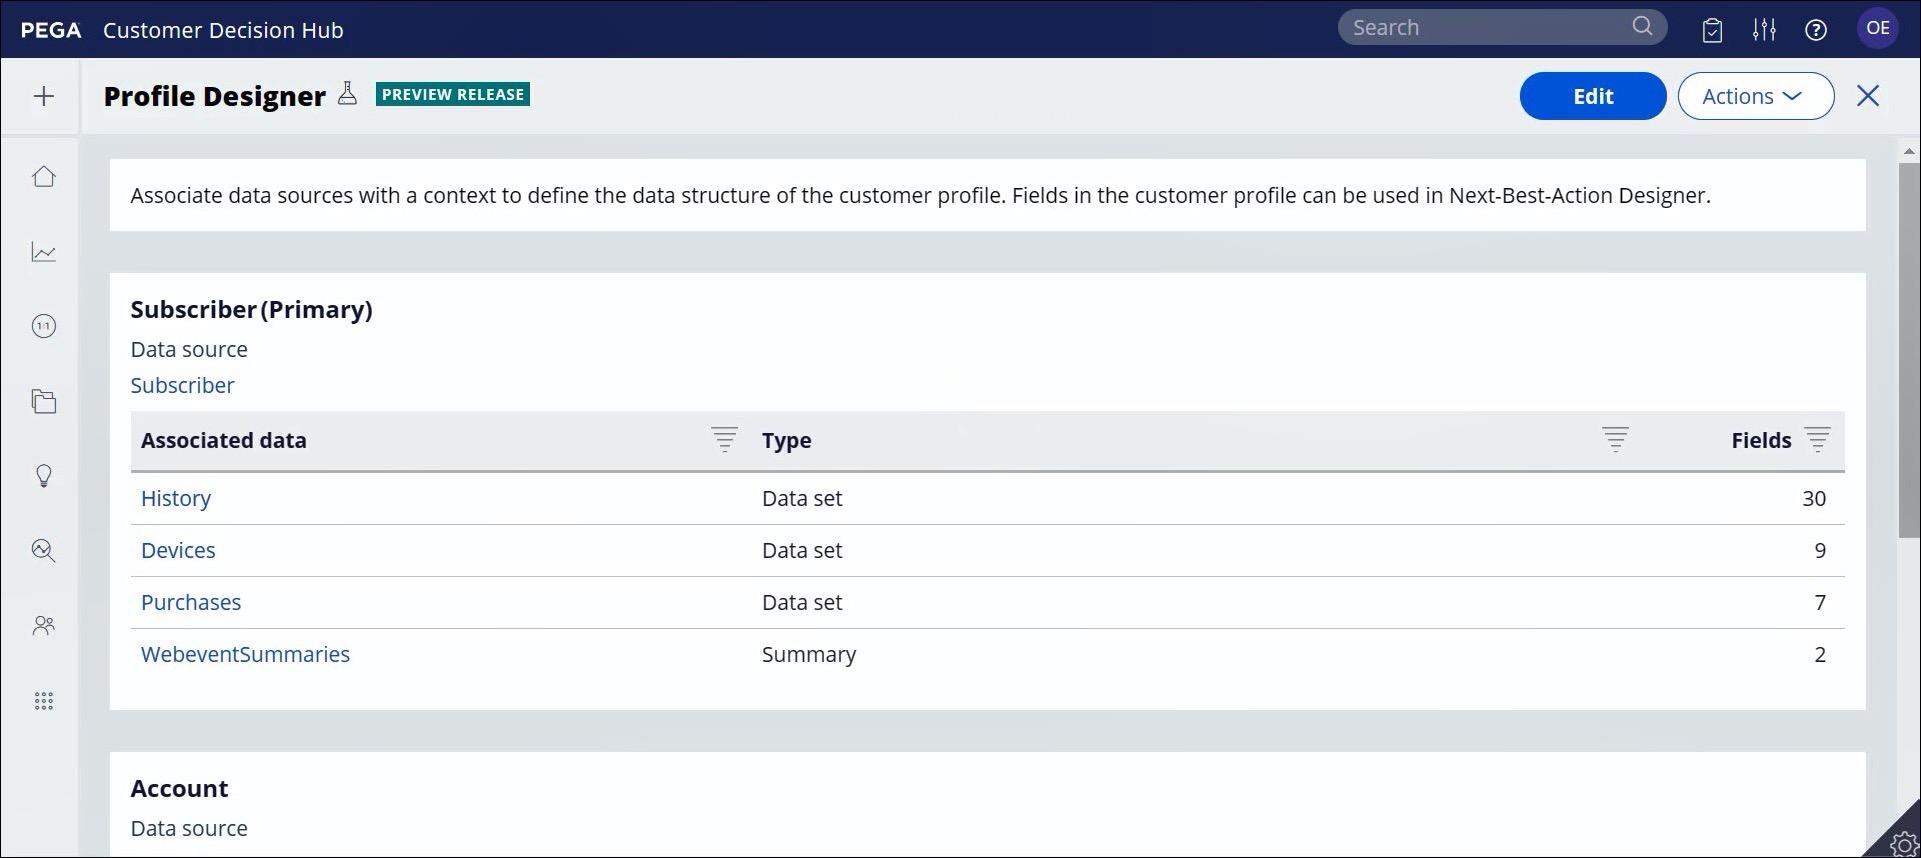 Customer Profile Designer view